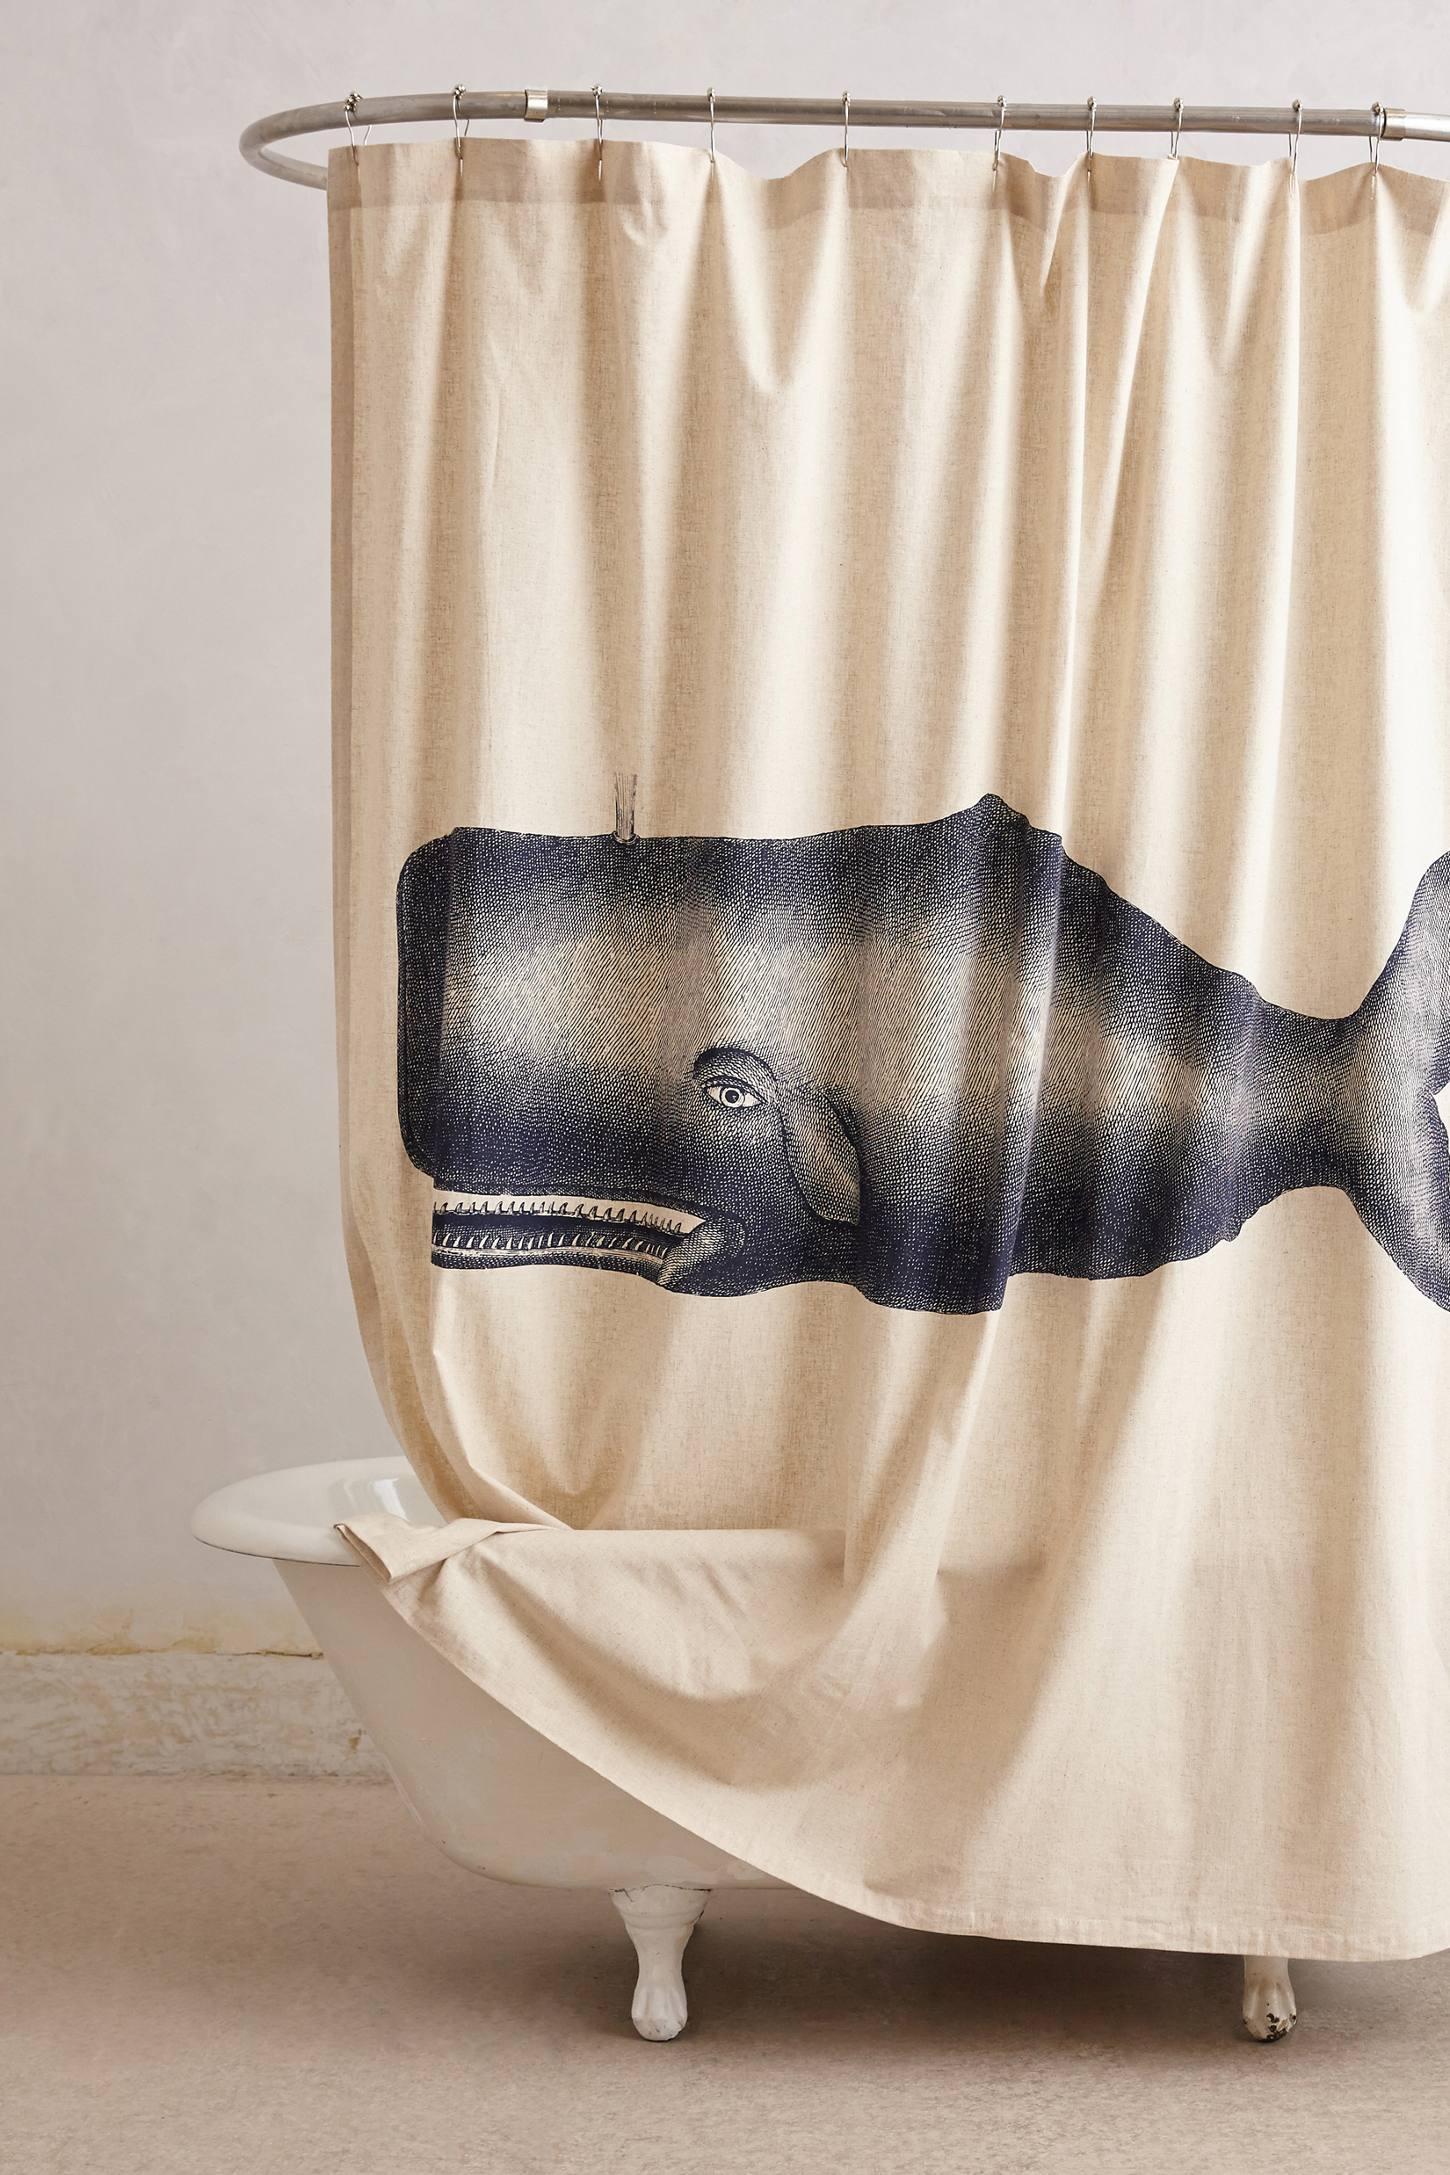 Whale shower curtain - Whale Shower Curtain Hooks Anthropologie Shower Curtain Hooks